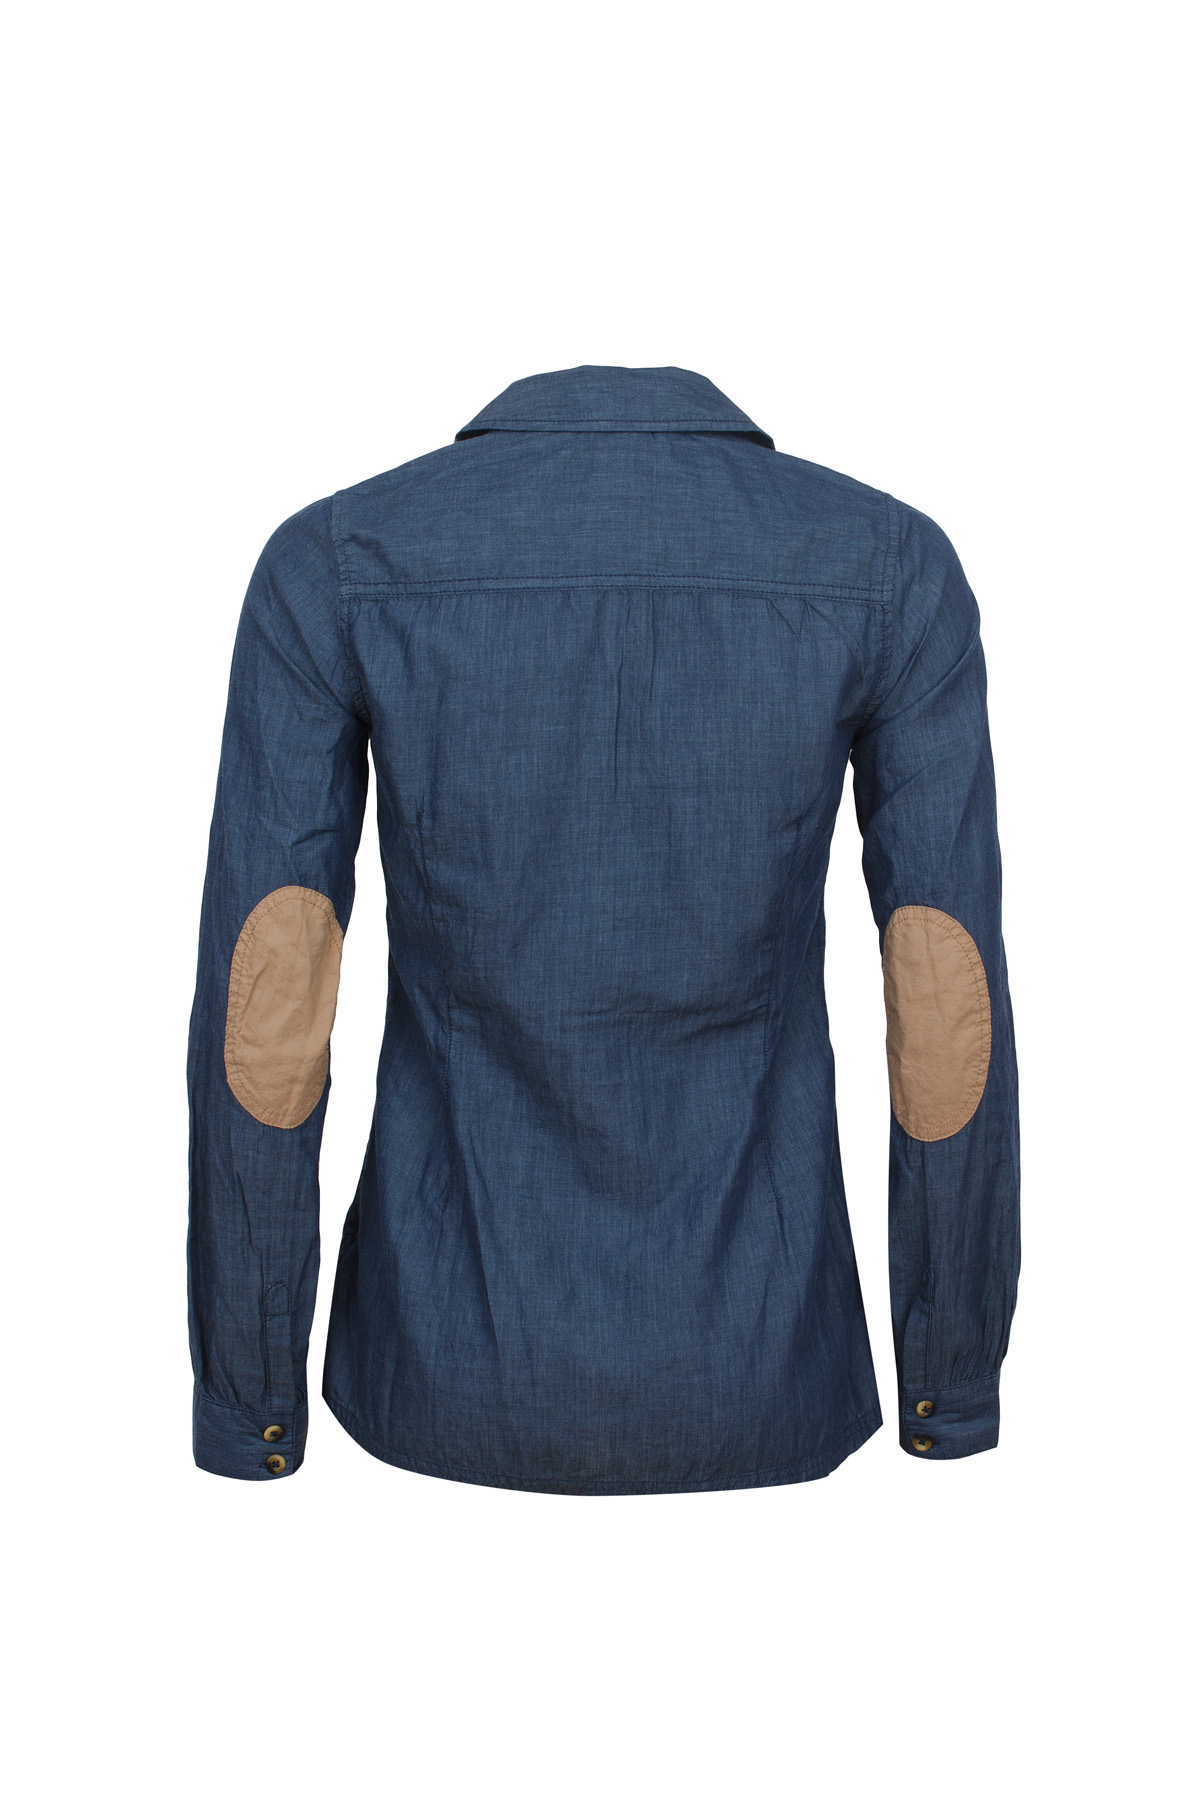 tom tailor damen jeans bluse chambray patches 2017157 ebay. Black Bedroom Furniture Sets. Home Design Ideas